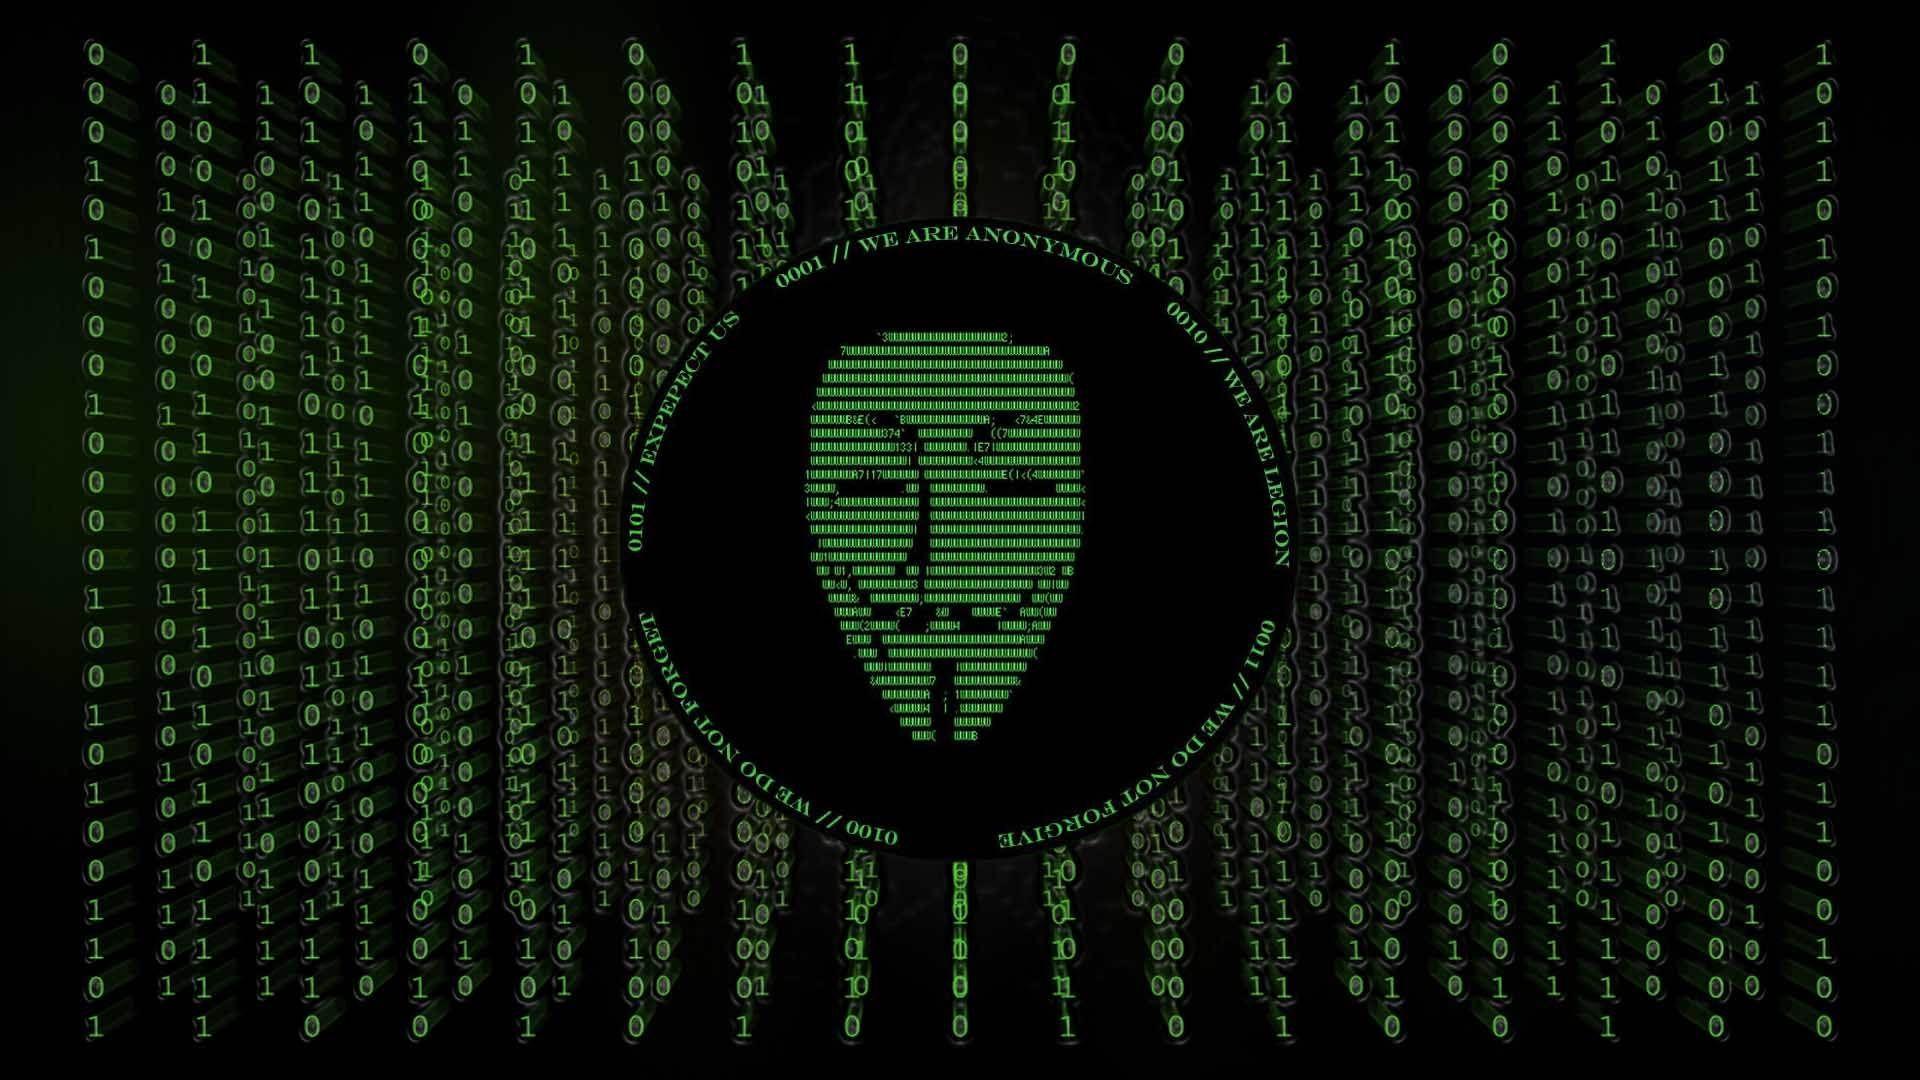 hacker hd wallpapers backgrounds wallpaper wallpapers in 2019 rh pinterest at